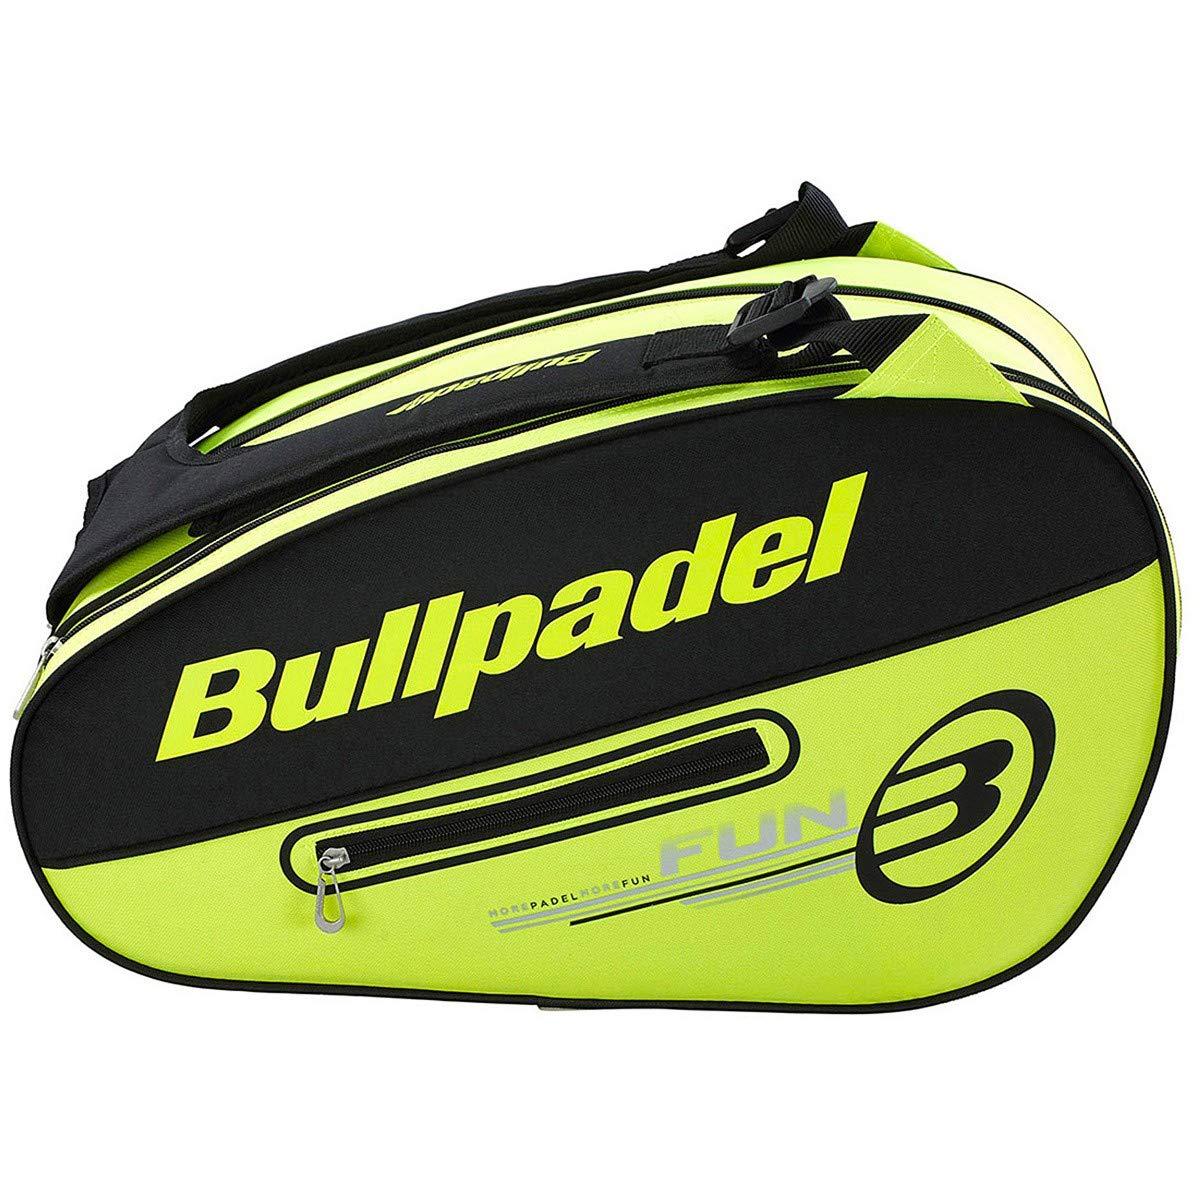 Bullpadel Bolsa Bpp-20004 Deporte, Hombre, Amarillo Limon Fluor ...